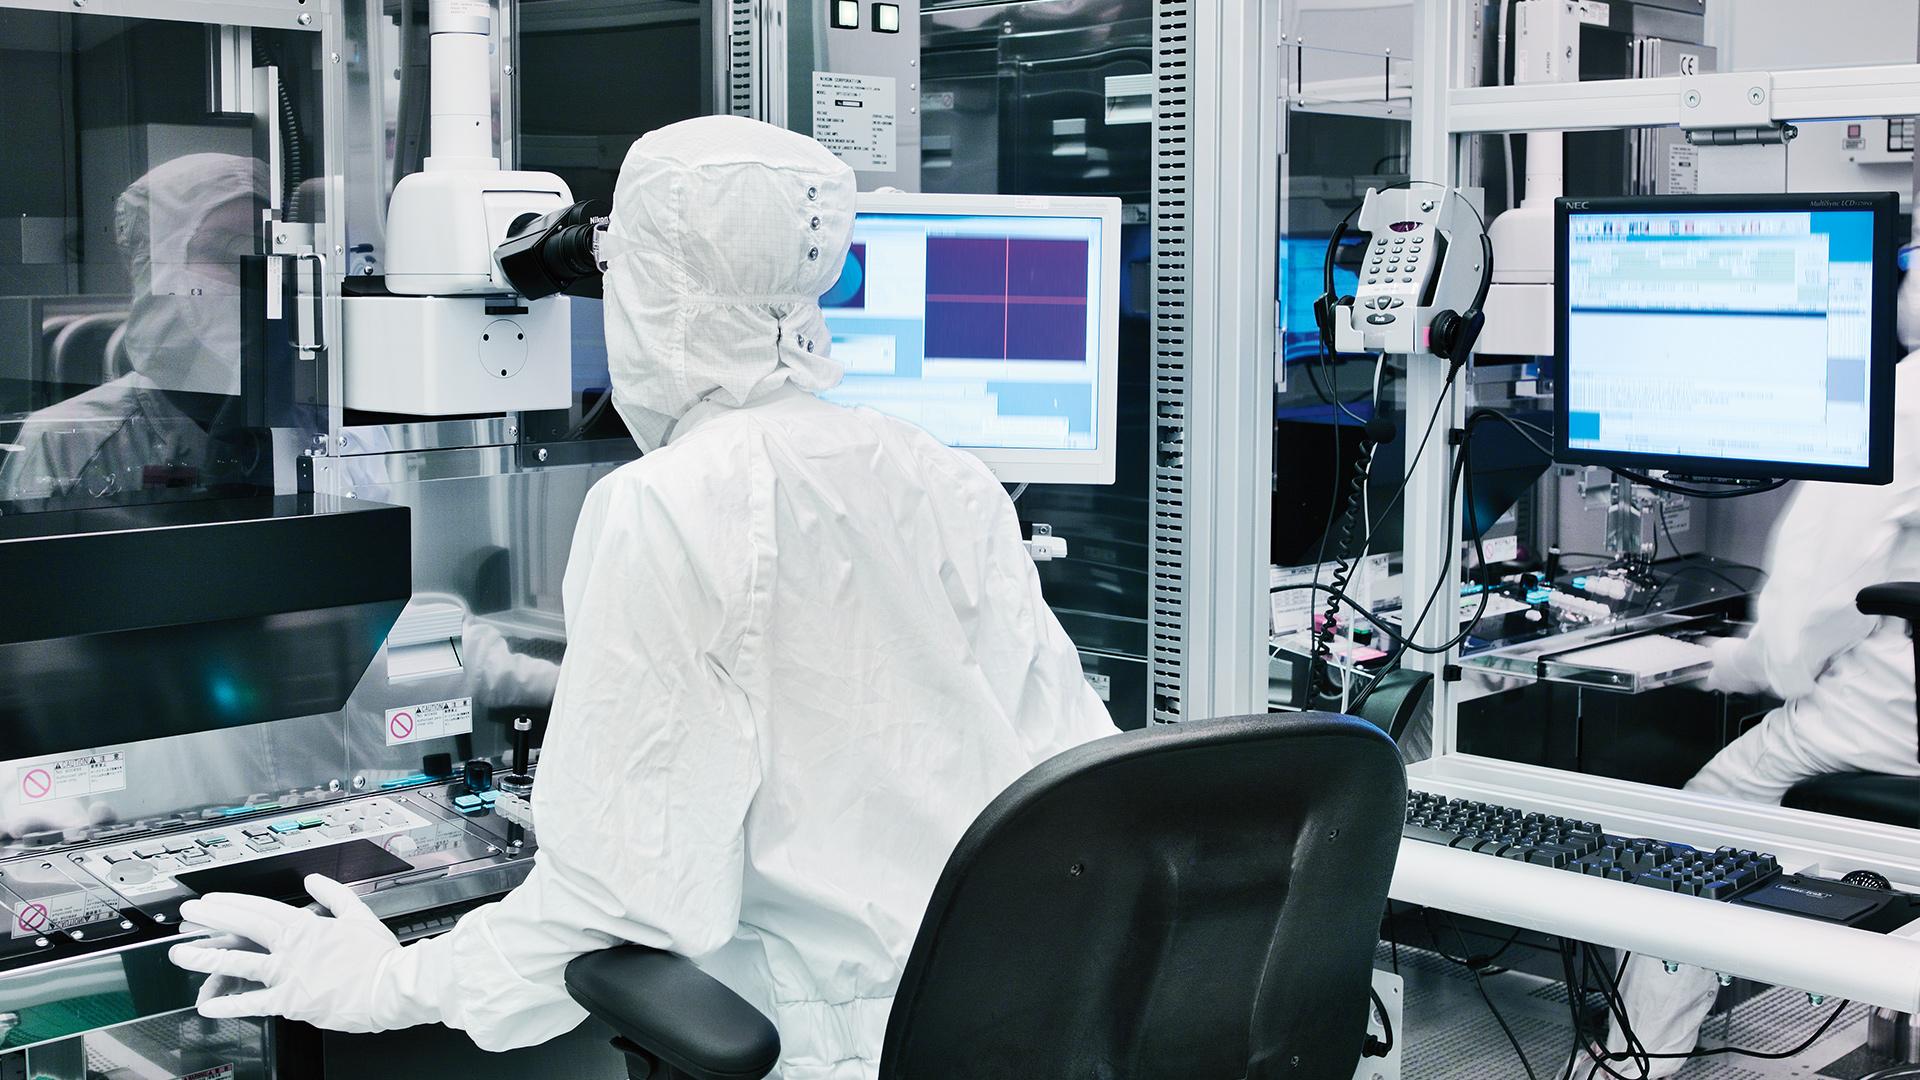 engineer-bunny-suit-working-microscope-rwd